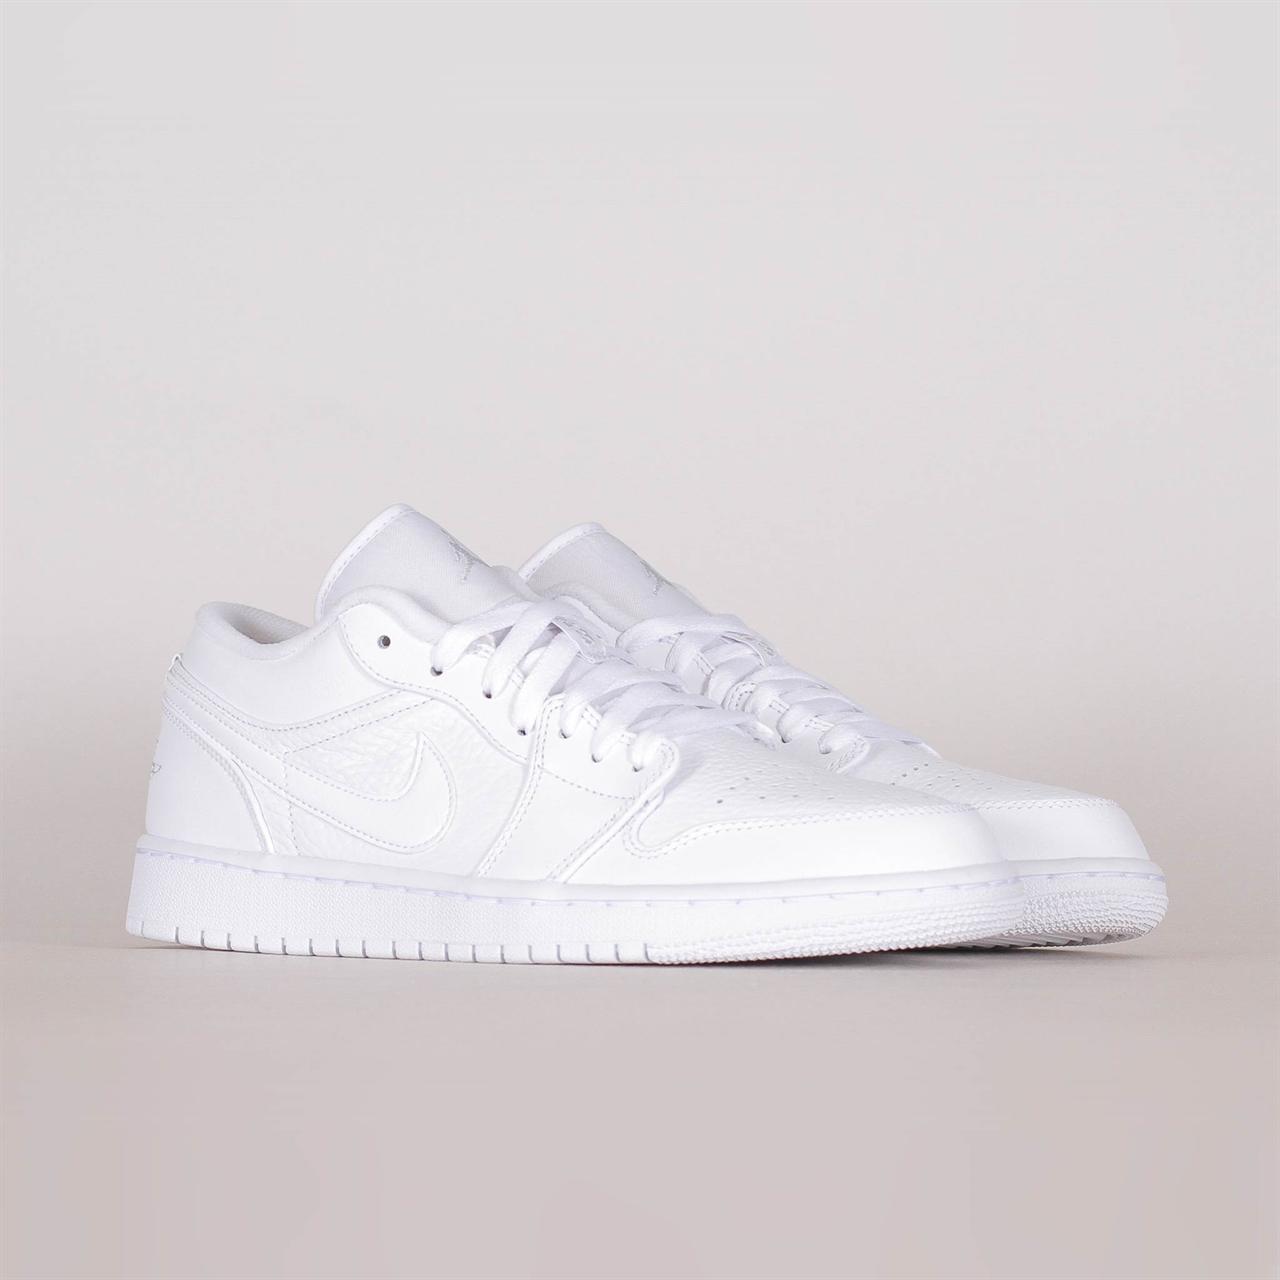 401a73d1e40d Shelta - Nike Air Jordan 1 Low (553558-111)